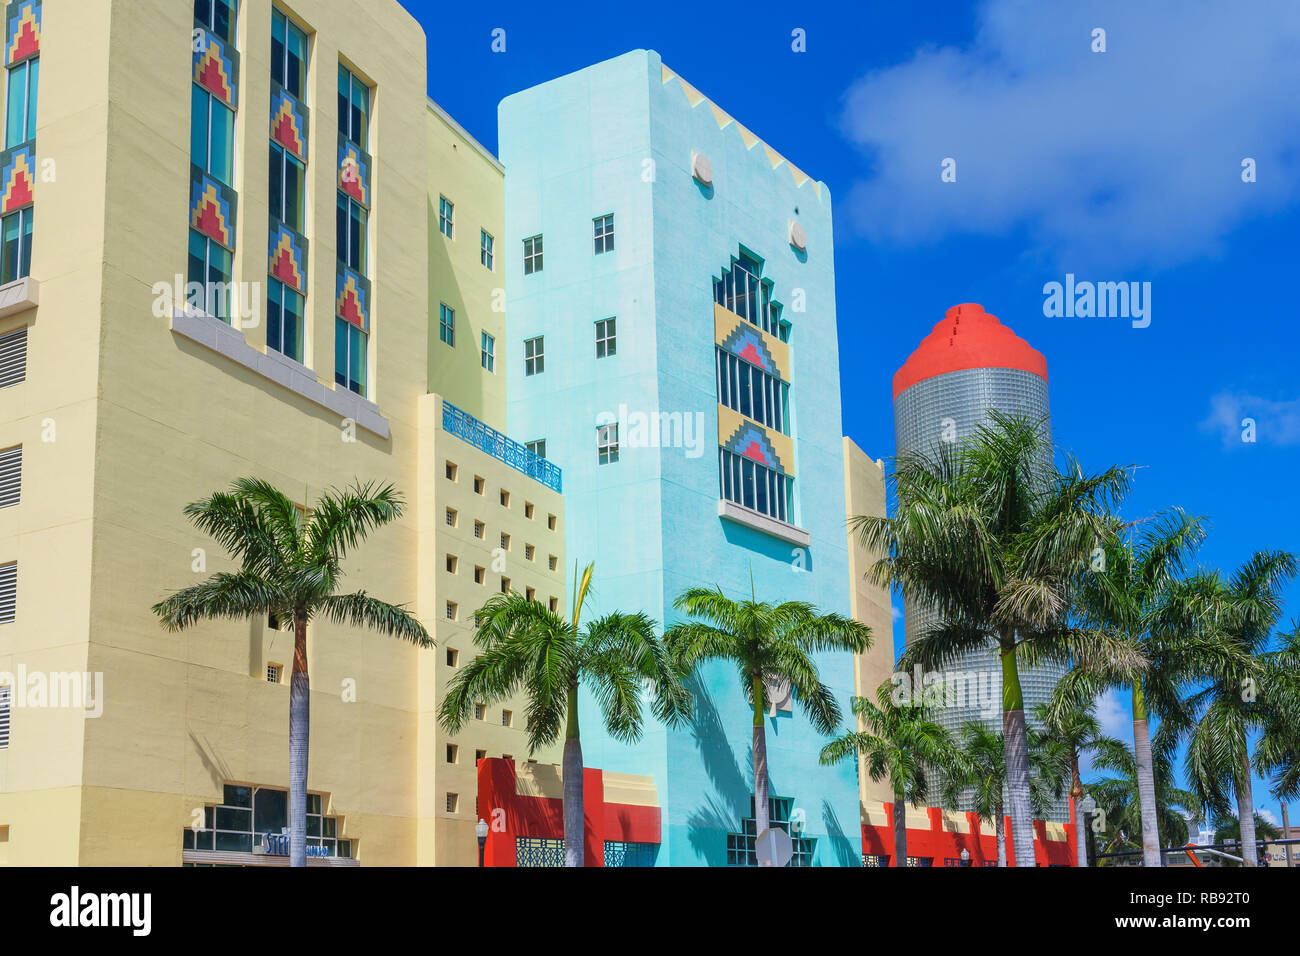 Art Deco District, South Beach, Miami, Florida, USA - Stock Image